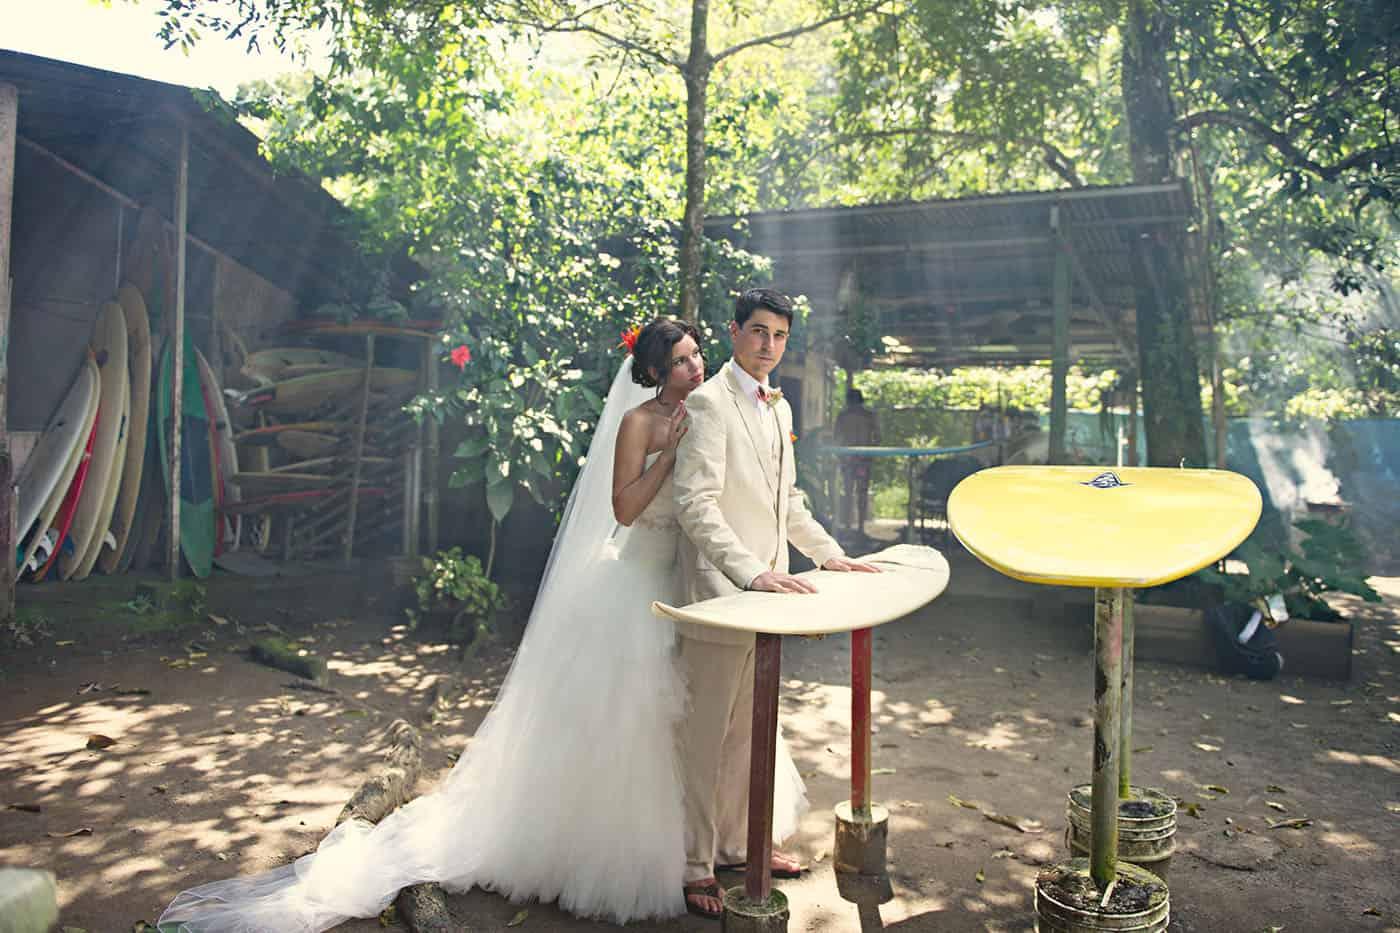 A Destination Wedding Photography Guide